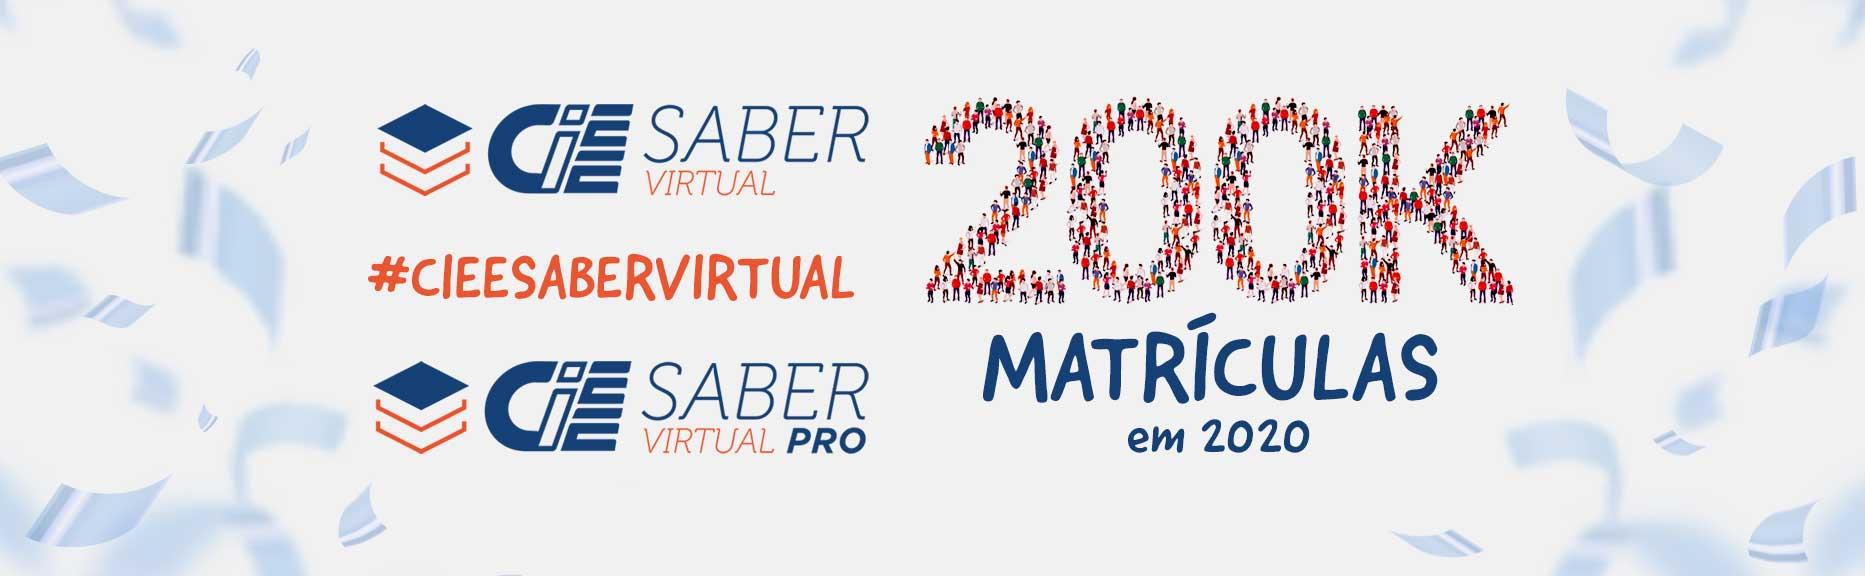 CIEE Saber Virtual - 200K matrículas em 2020